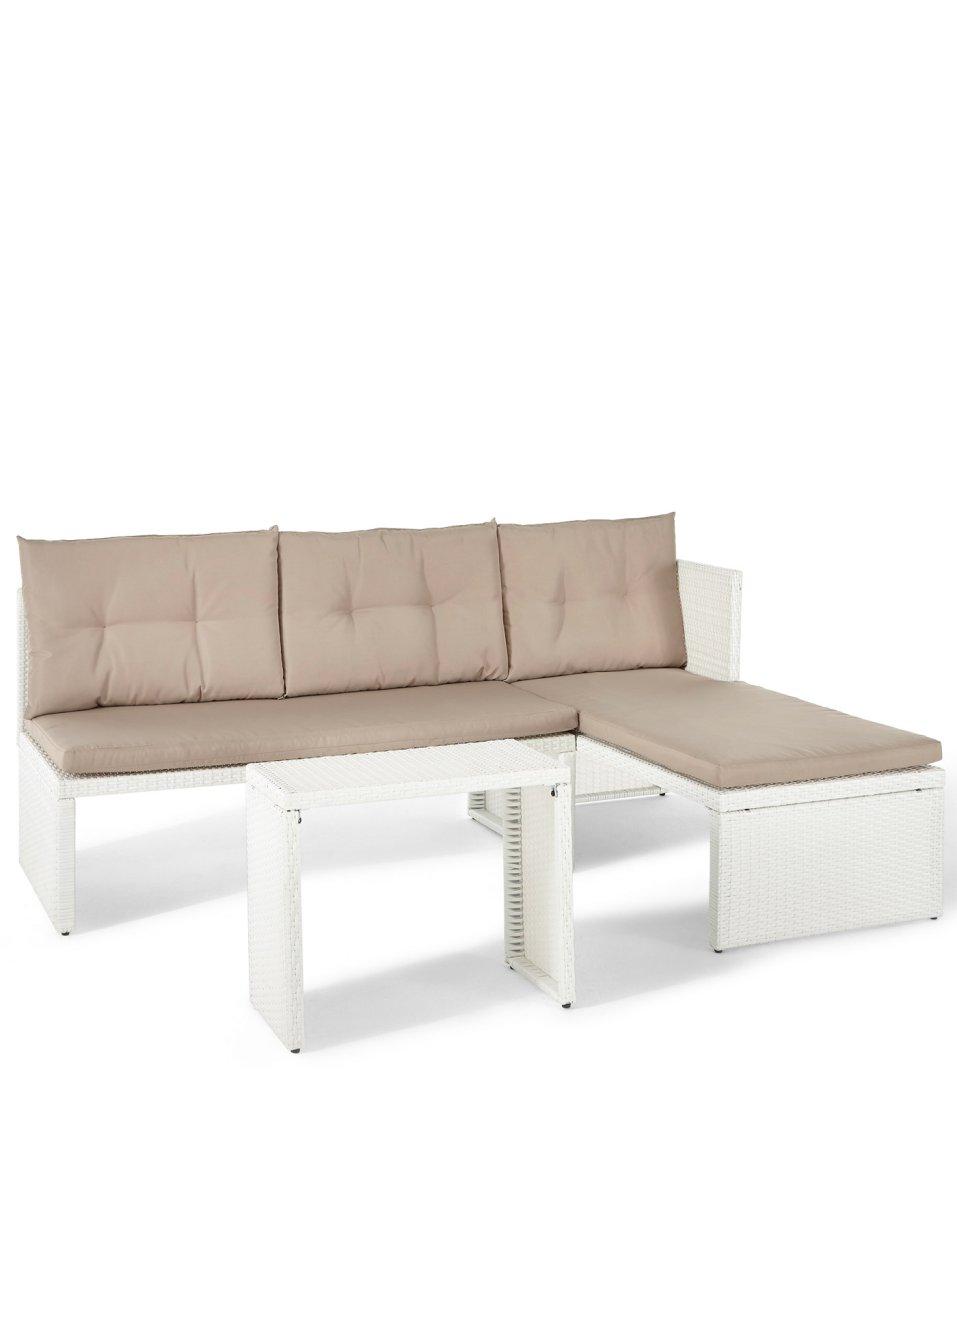 Mobili per balcone «Rhodos» (set 3 pezzi) Bianco/beige - Casa ...